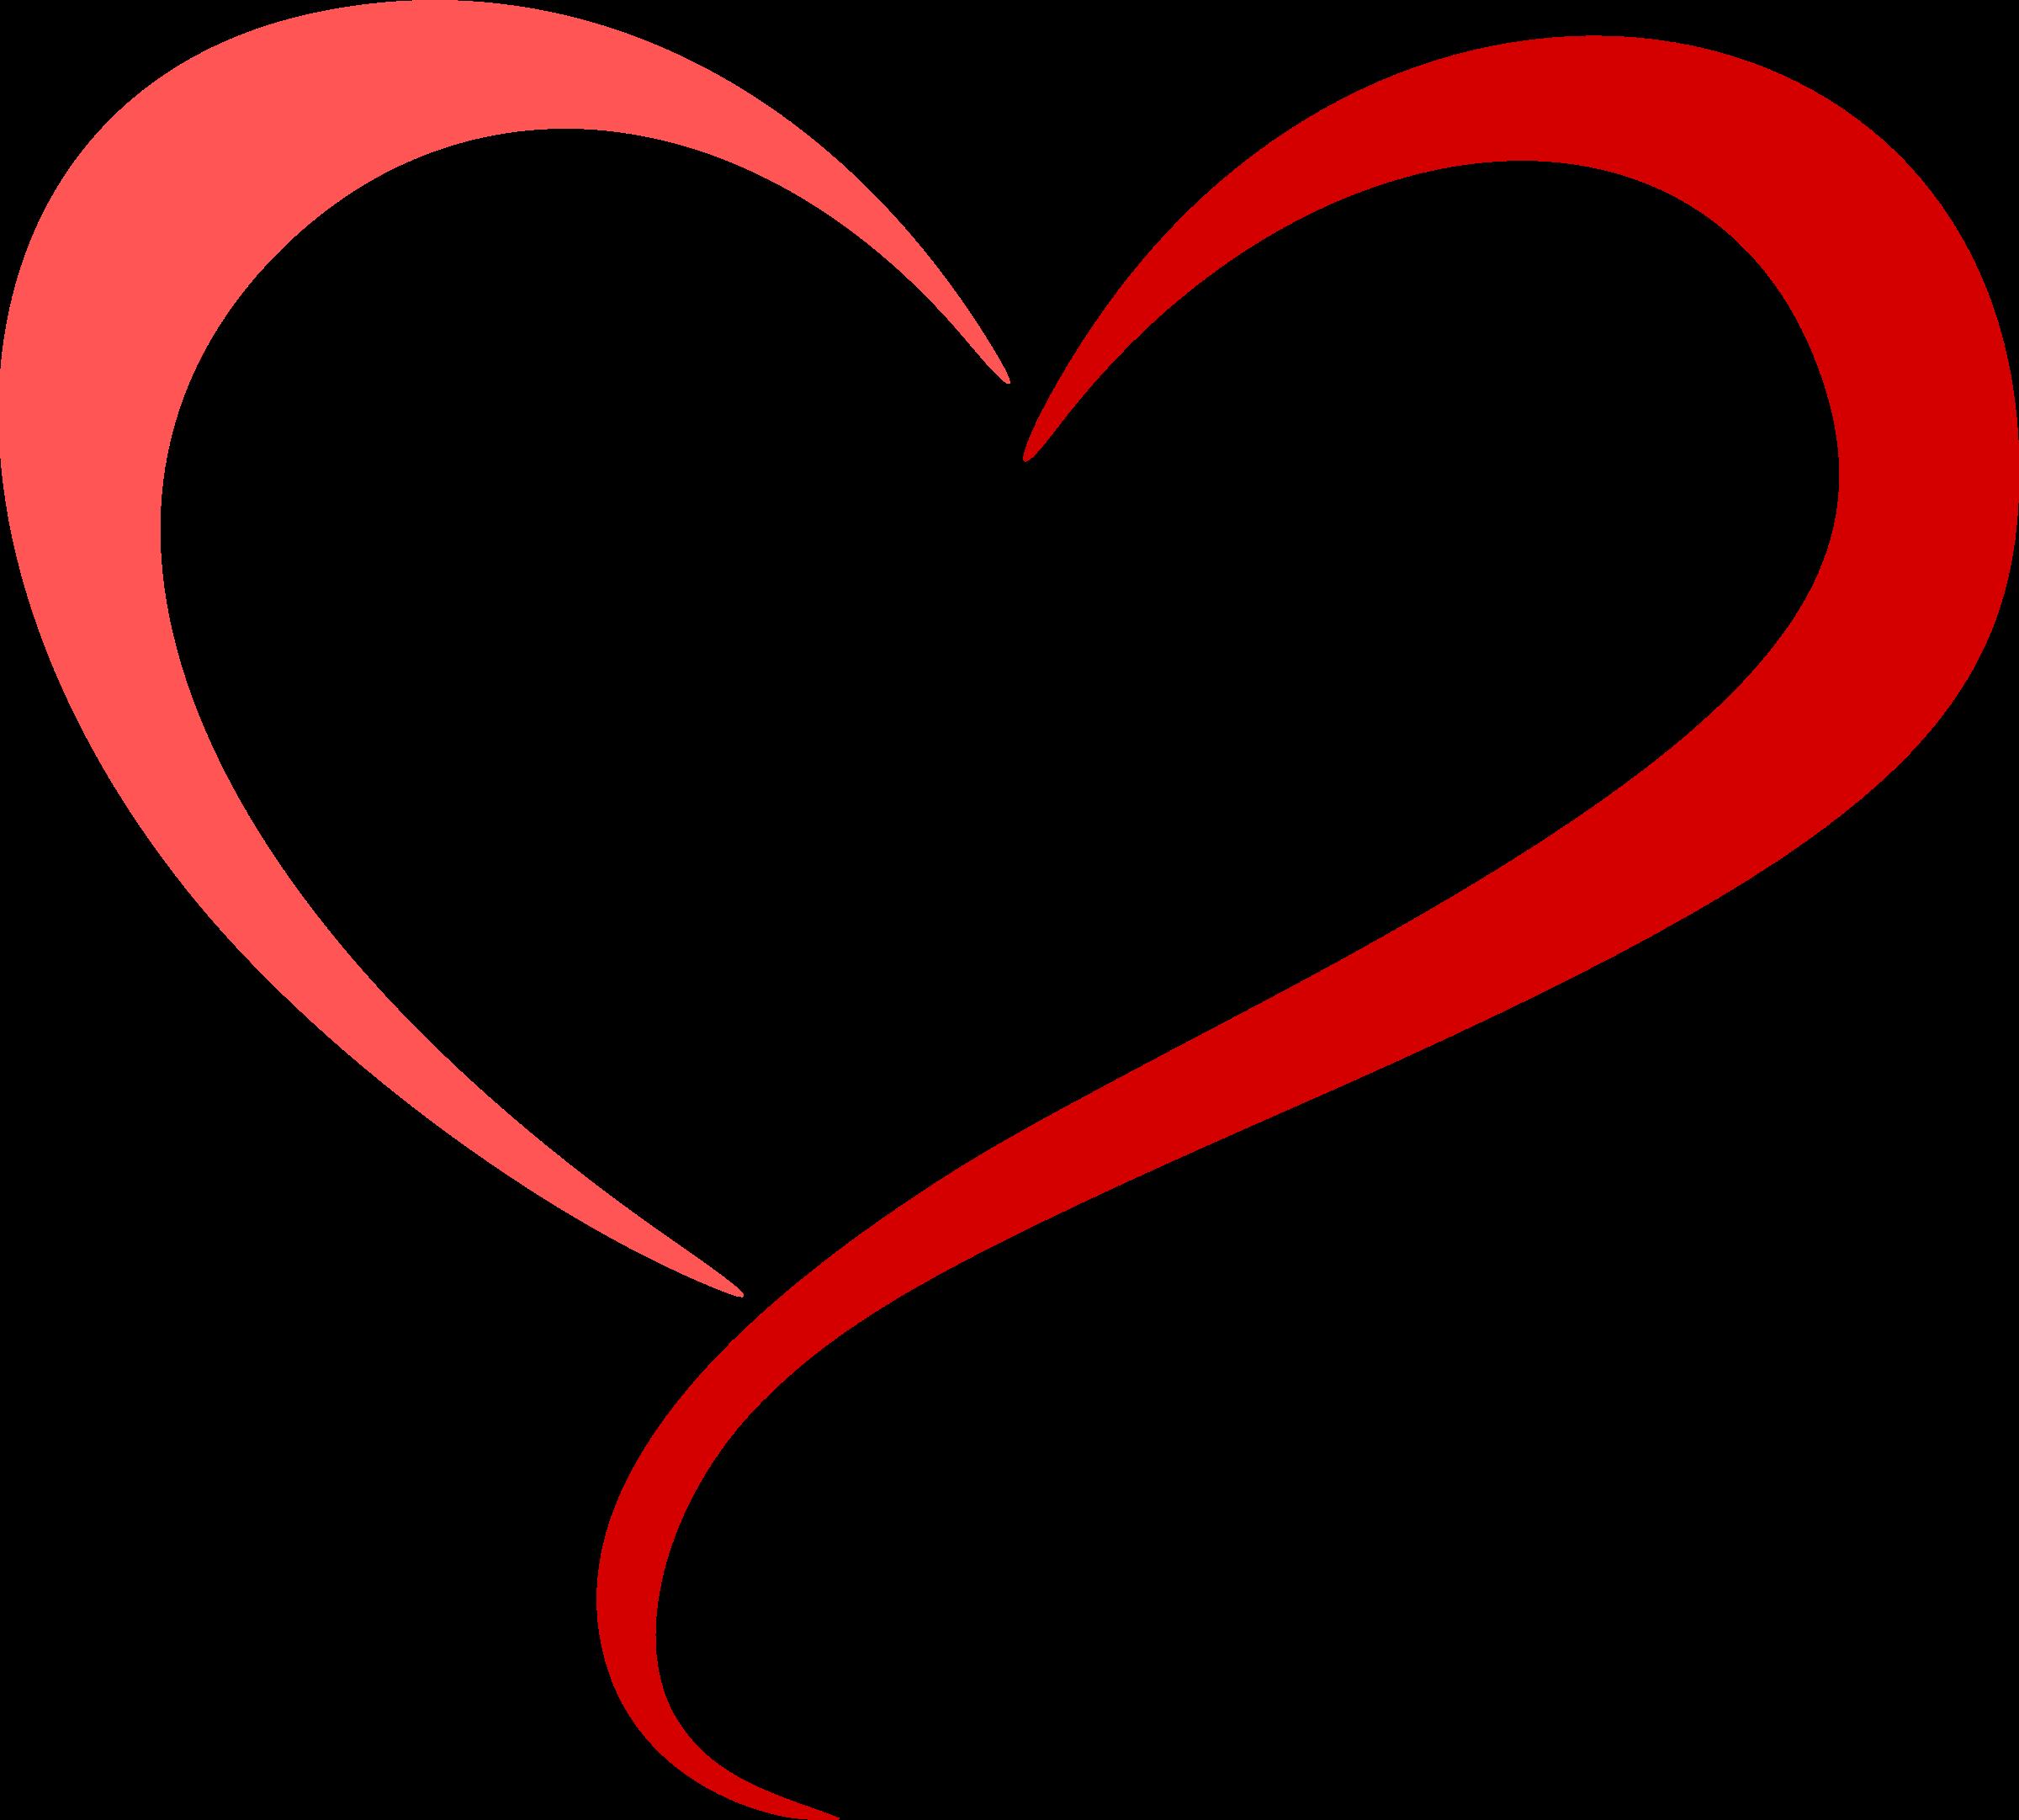 Hearts clipart watermelon. Heart valentine s day